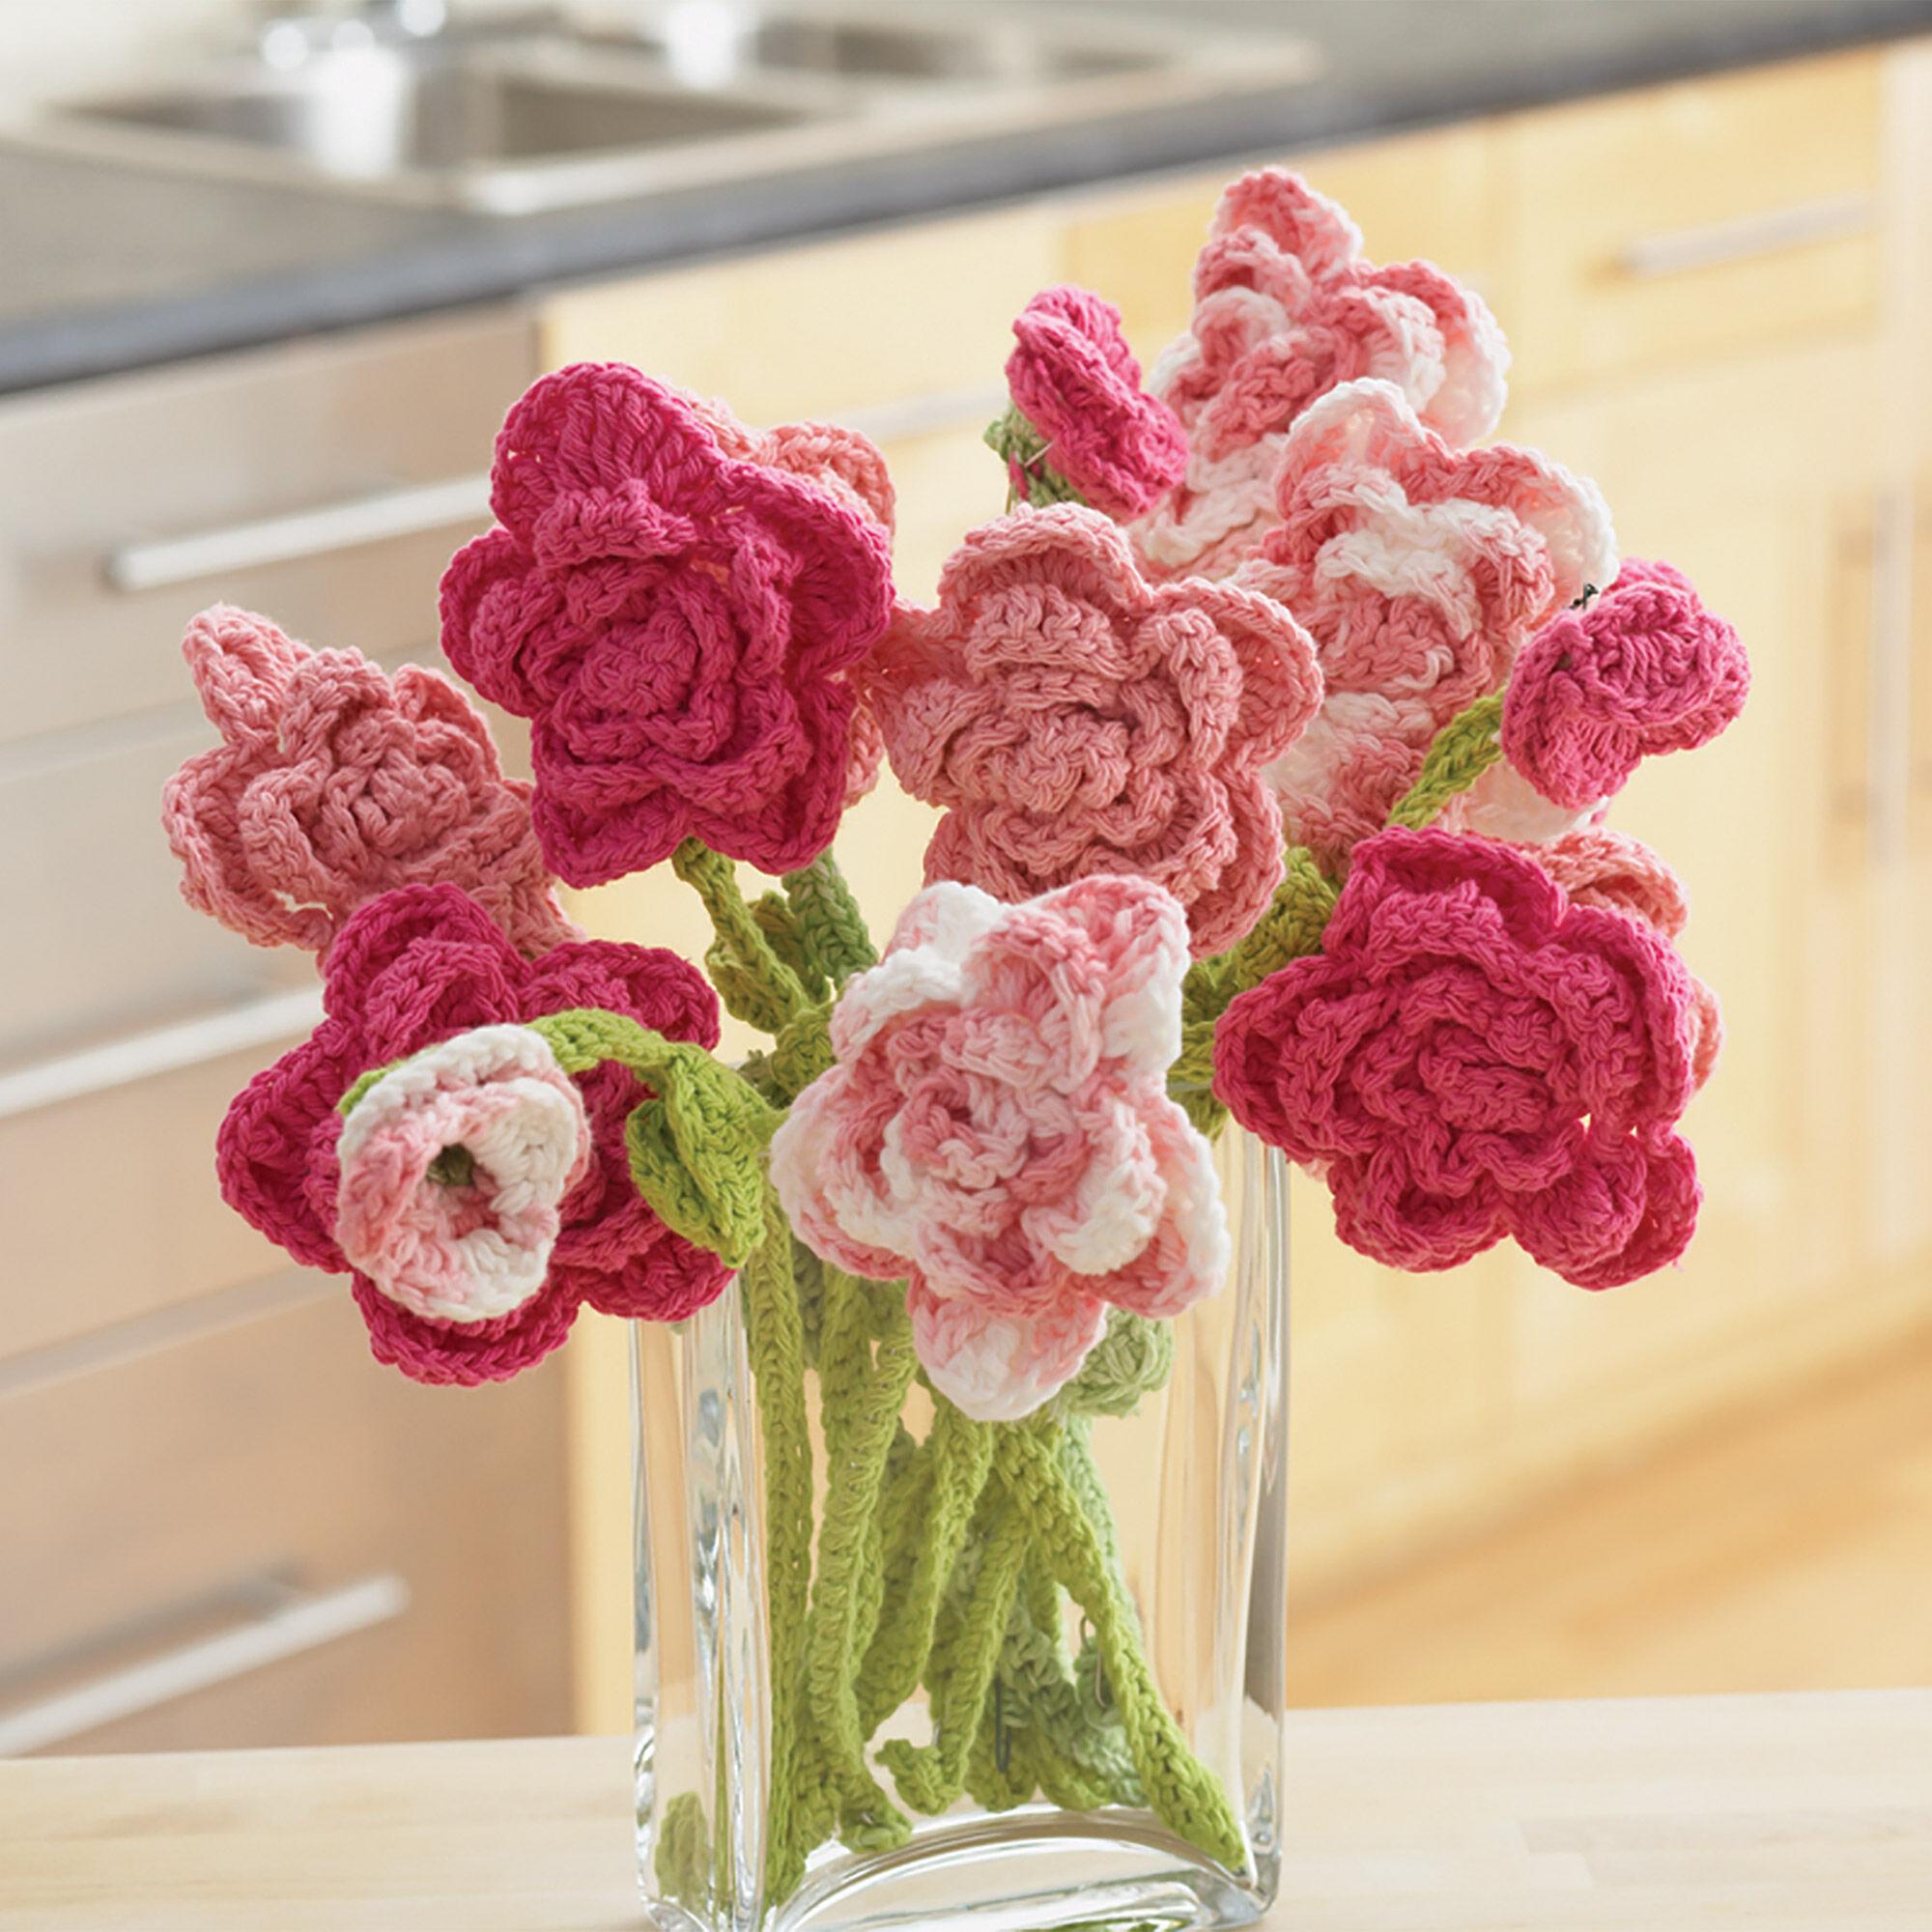 Lily sugarn cream rose bouquet yarnspirations lily sugar39n cream rose bouquet izmirmasajfo